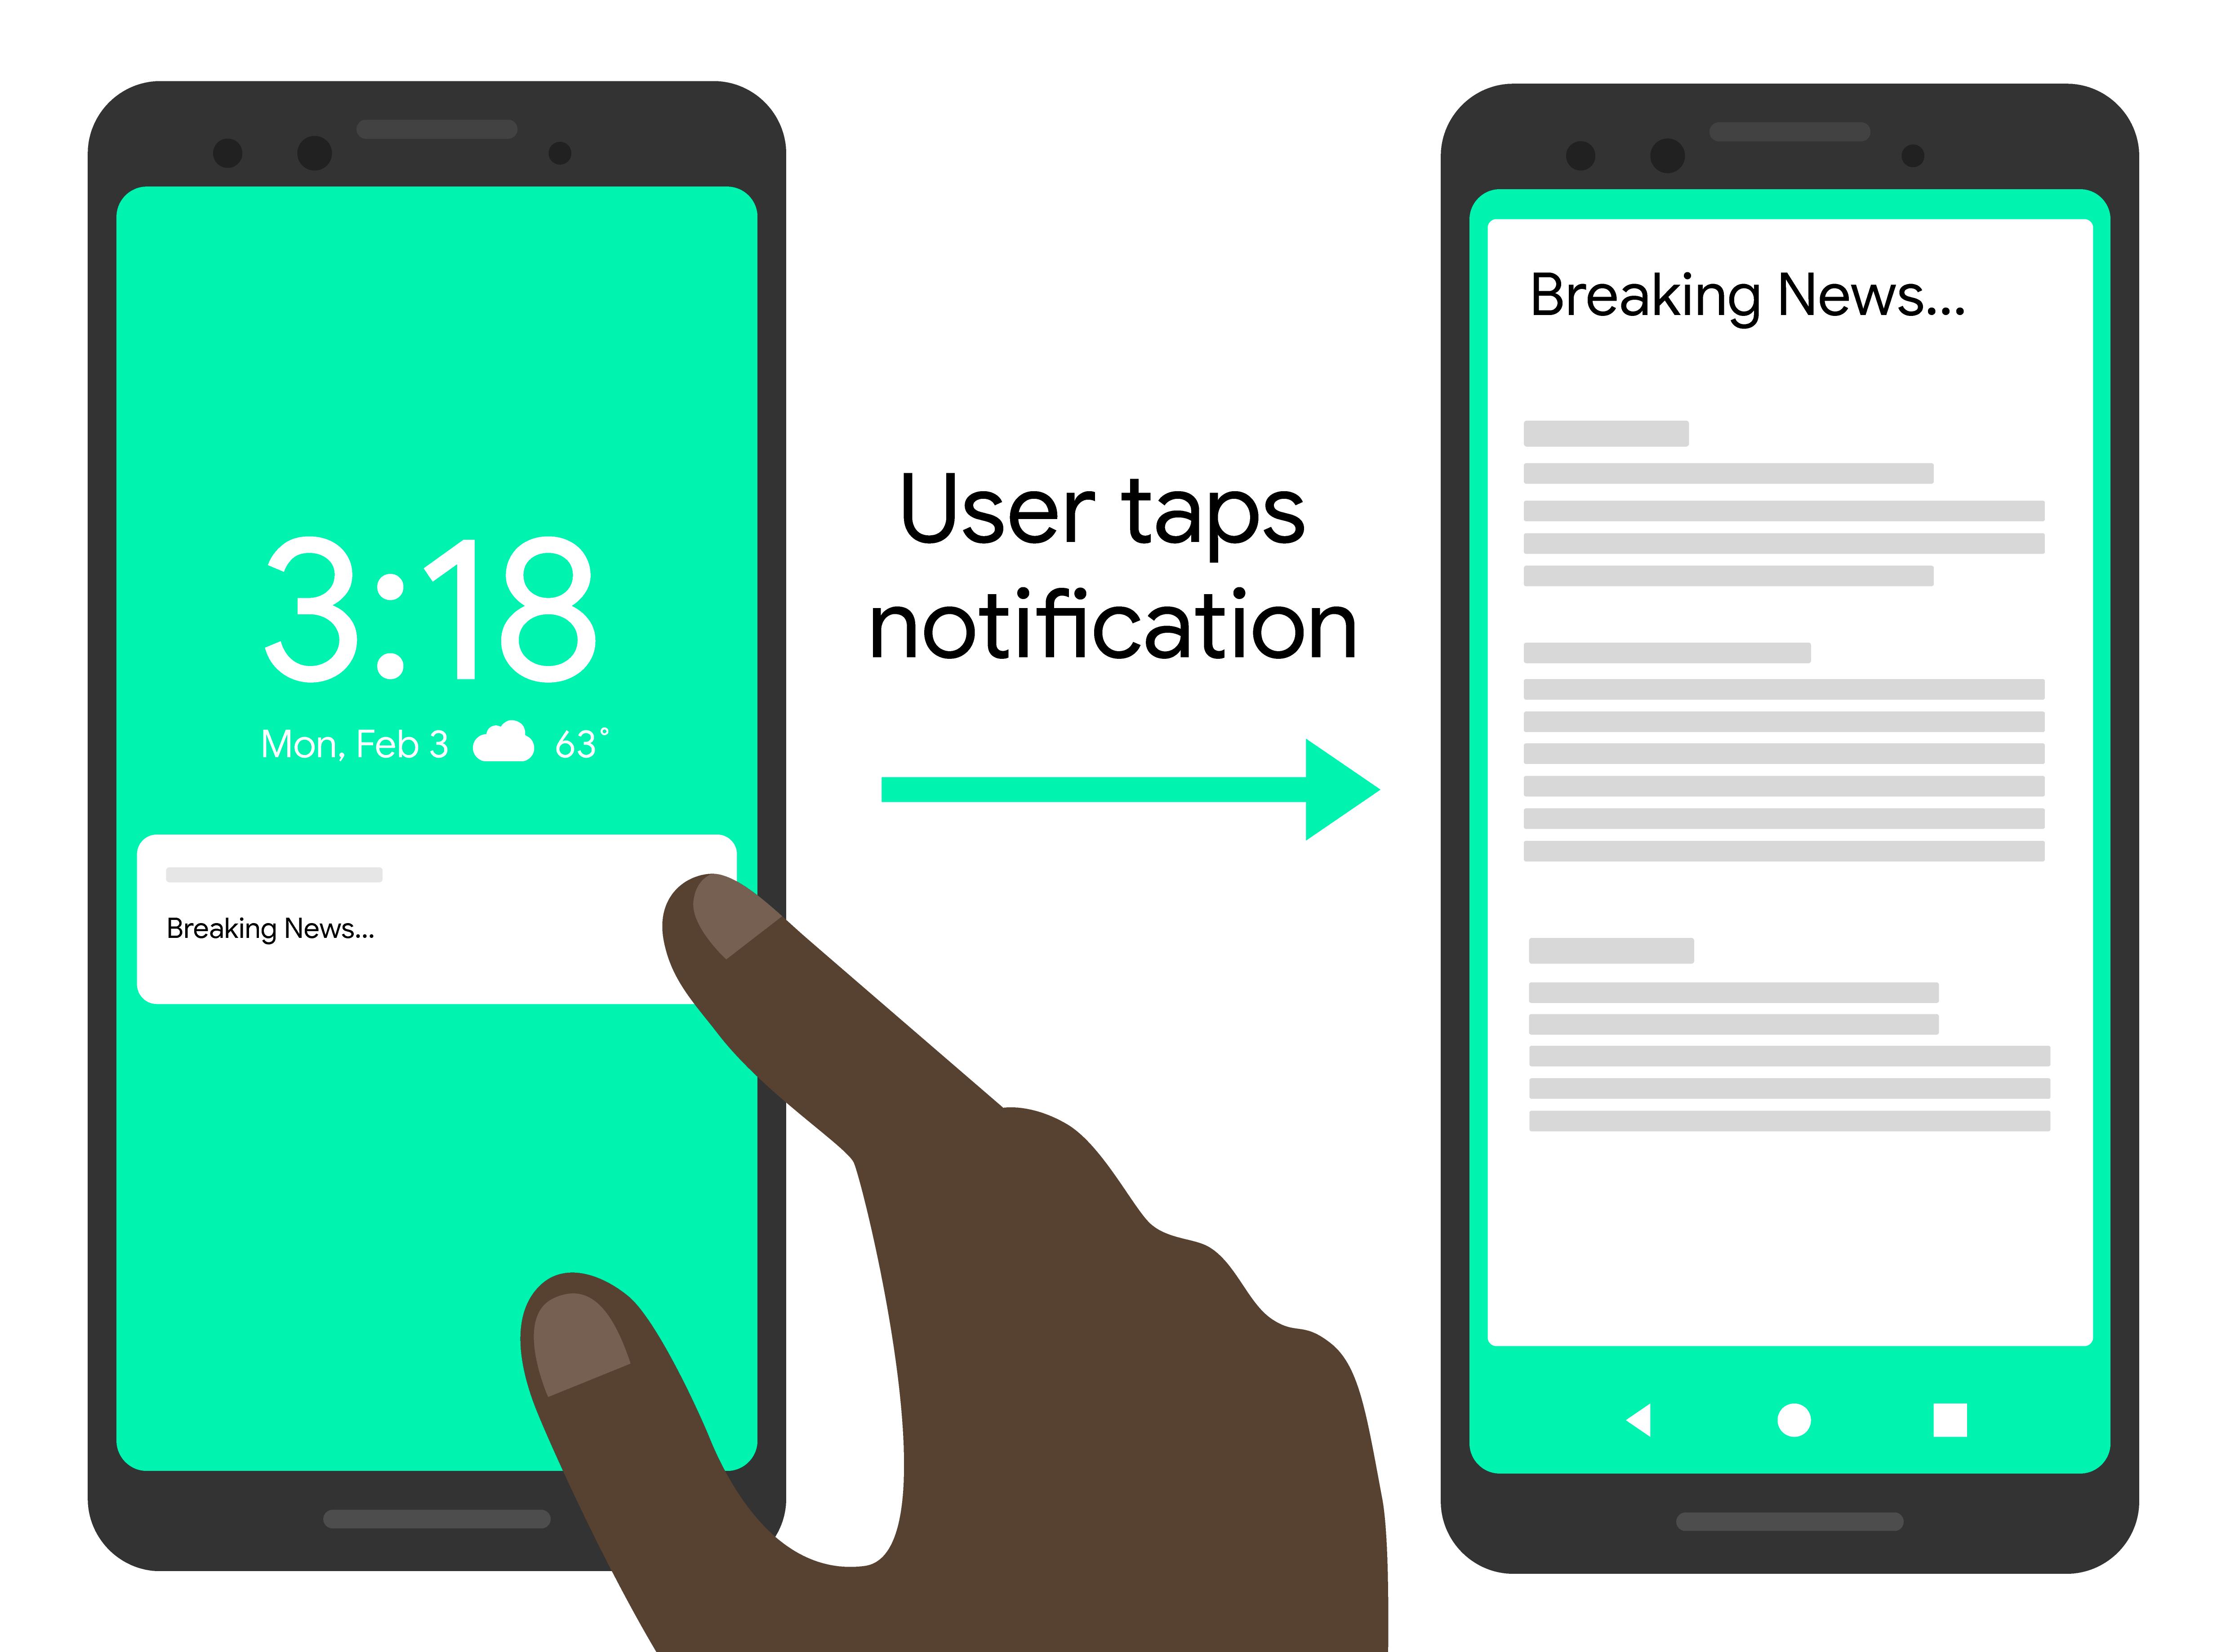 Gambar sederhana yang menunjukkan pengguna mengetuk untuk membuka halaman web